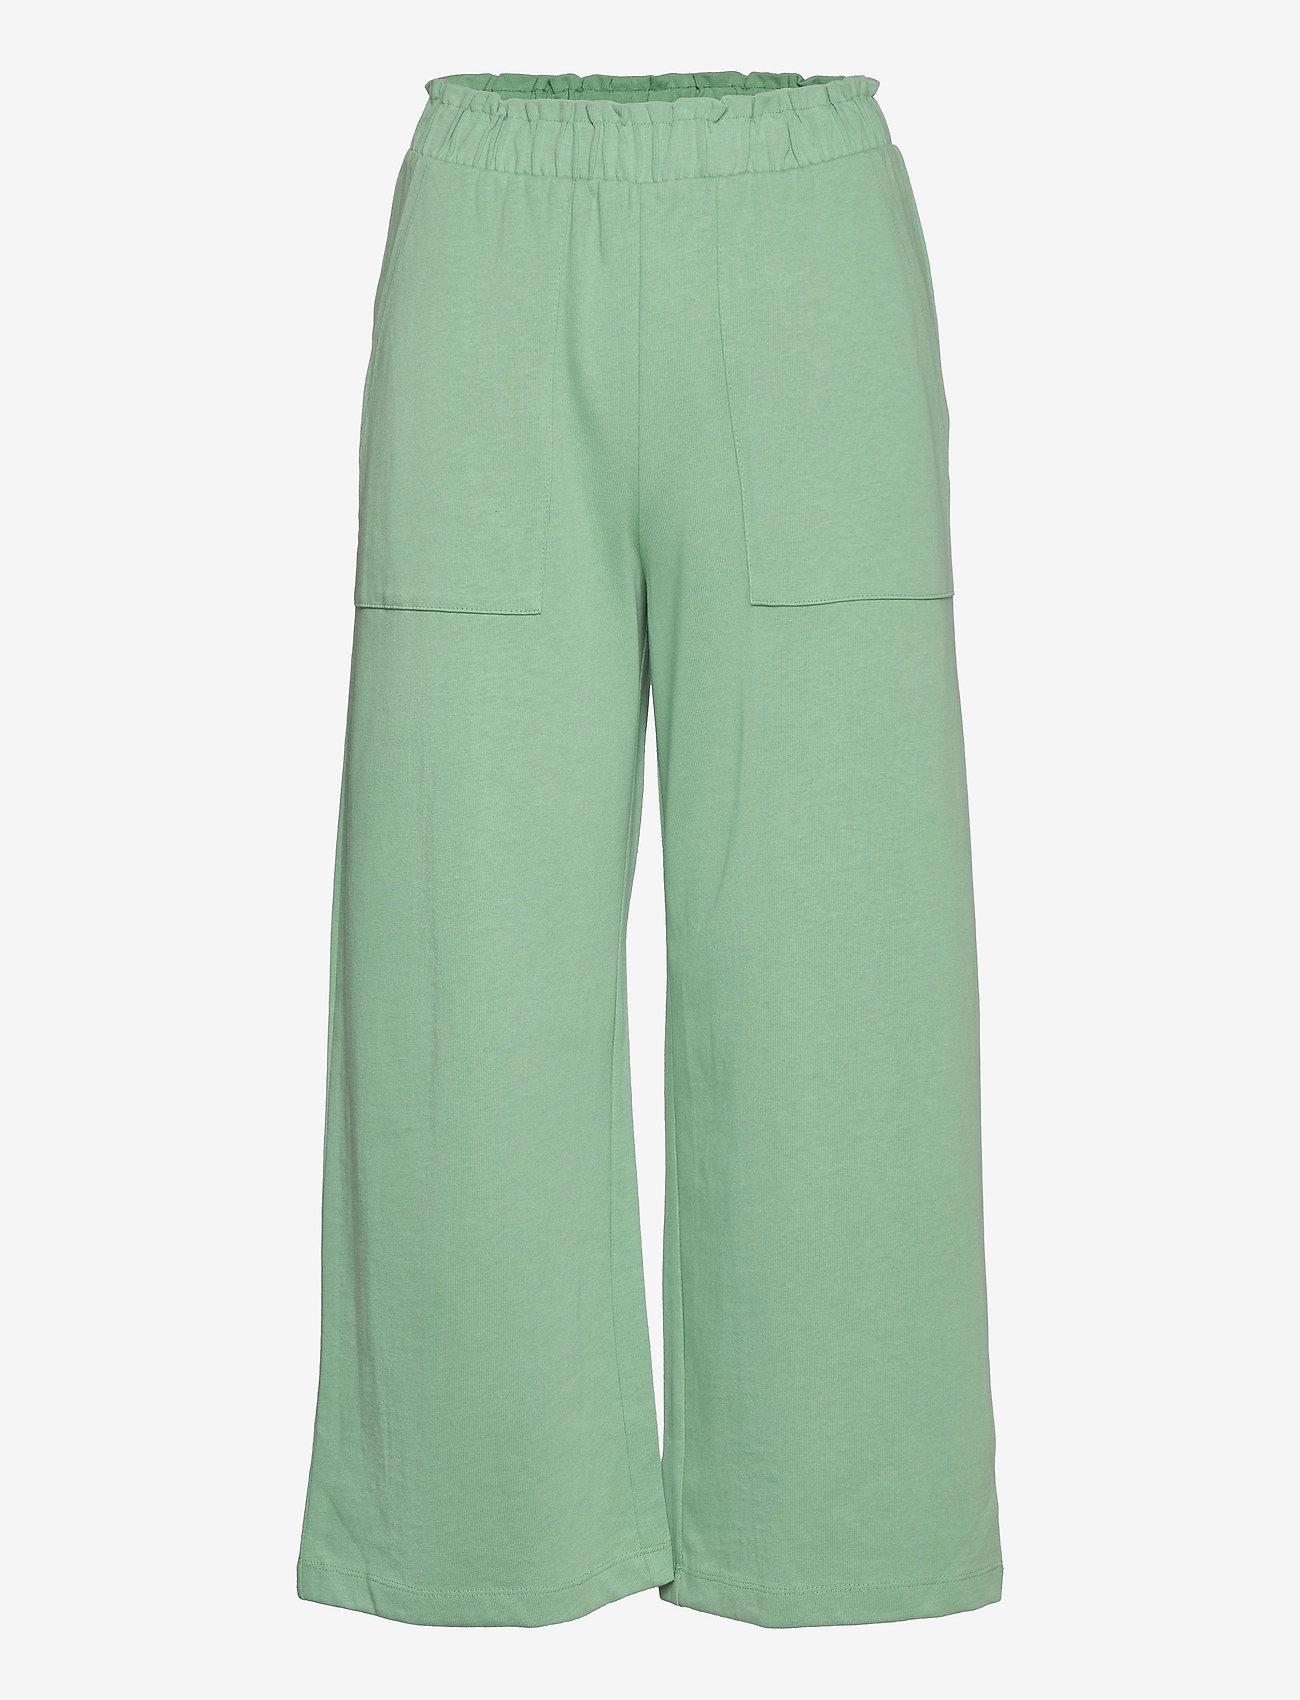 Mango - CLAY - bukser med brede ben - pastel green - 0